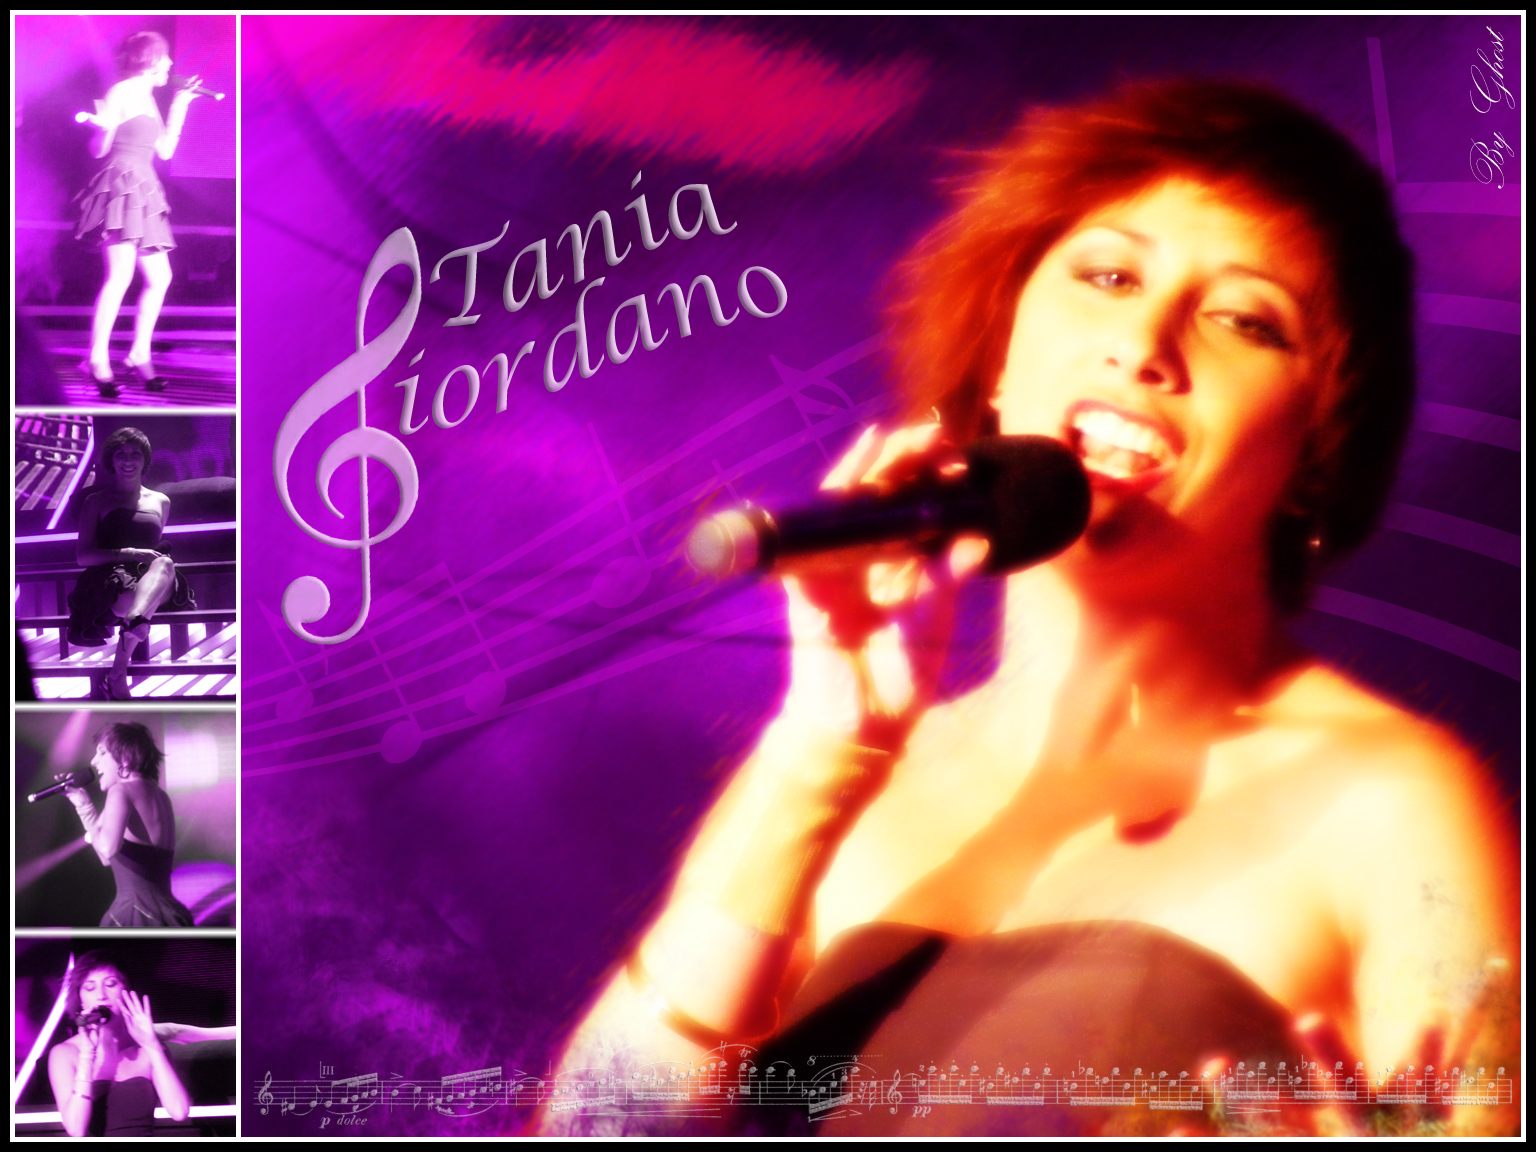 Tania Giordano by rEaNzUrO